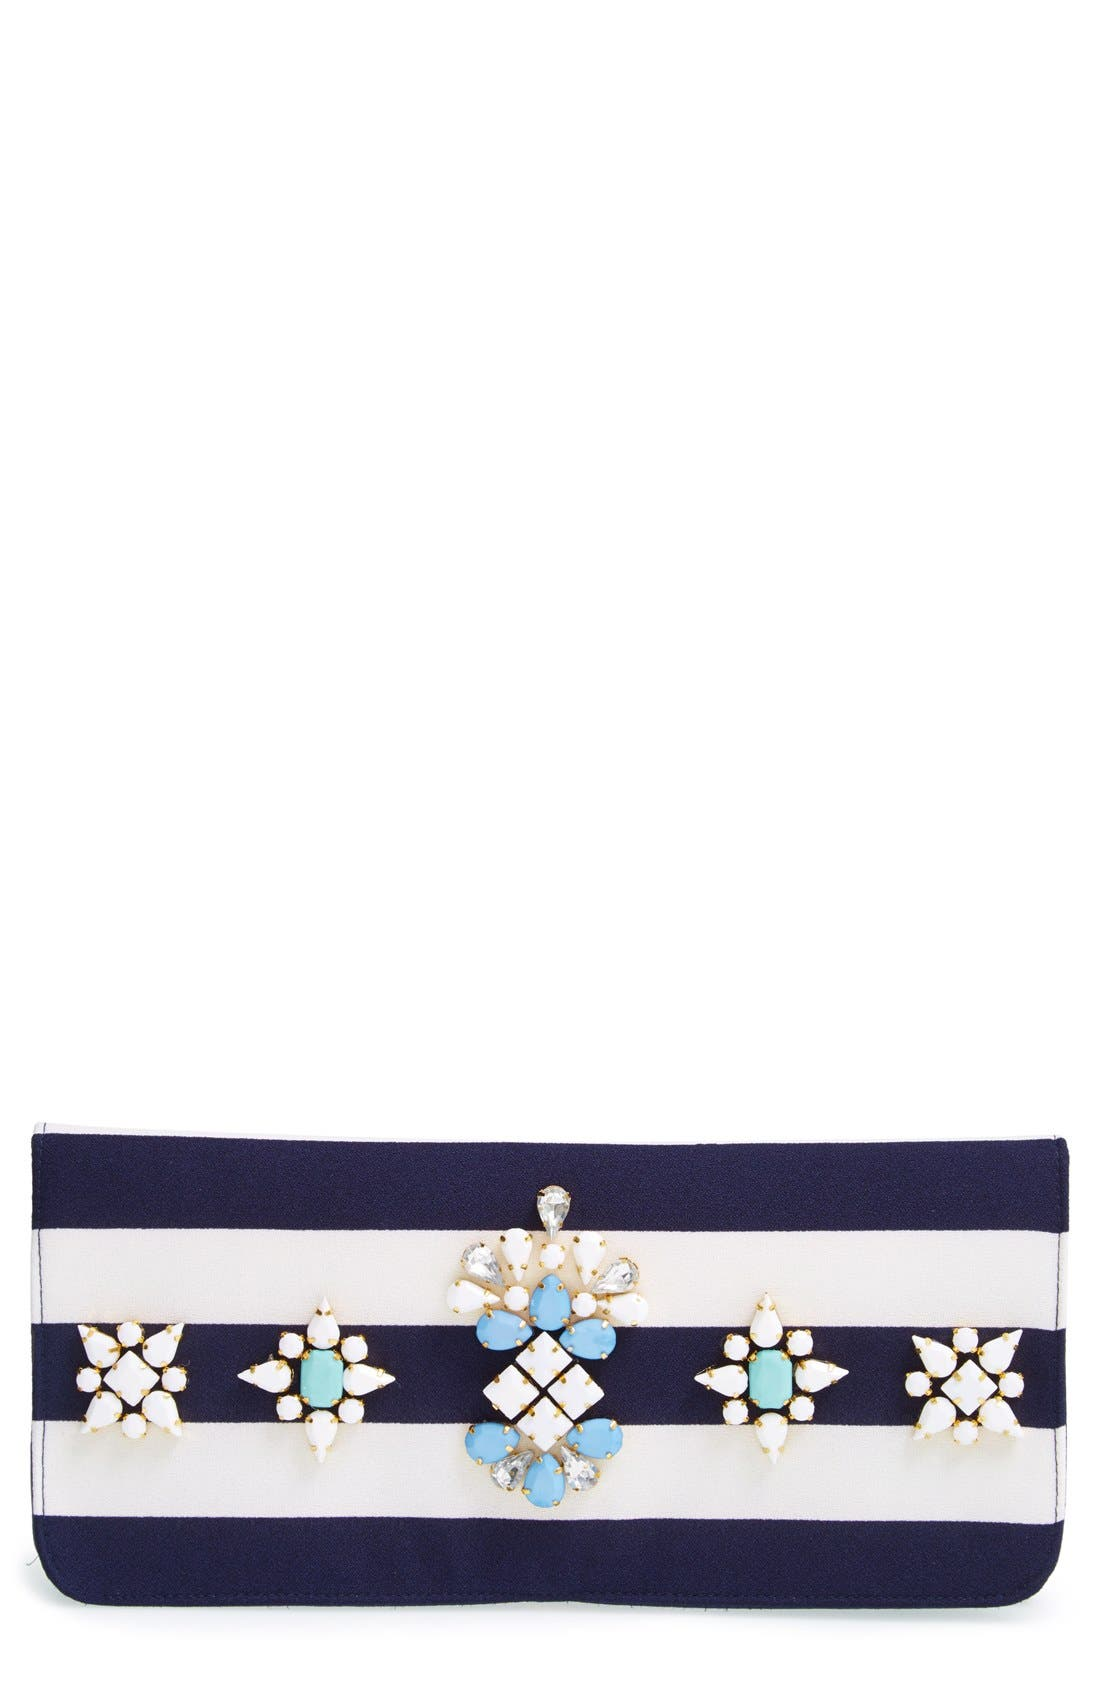 'Berenice' Embellished Stripe Clutch, Main, color, 400